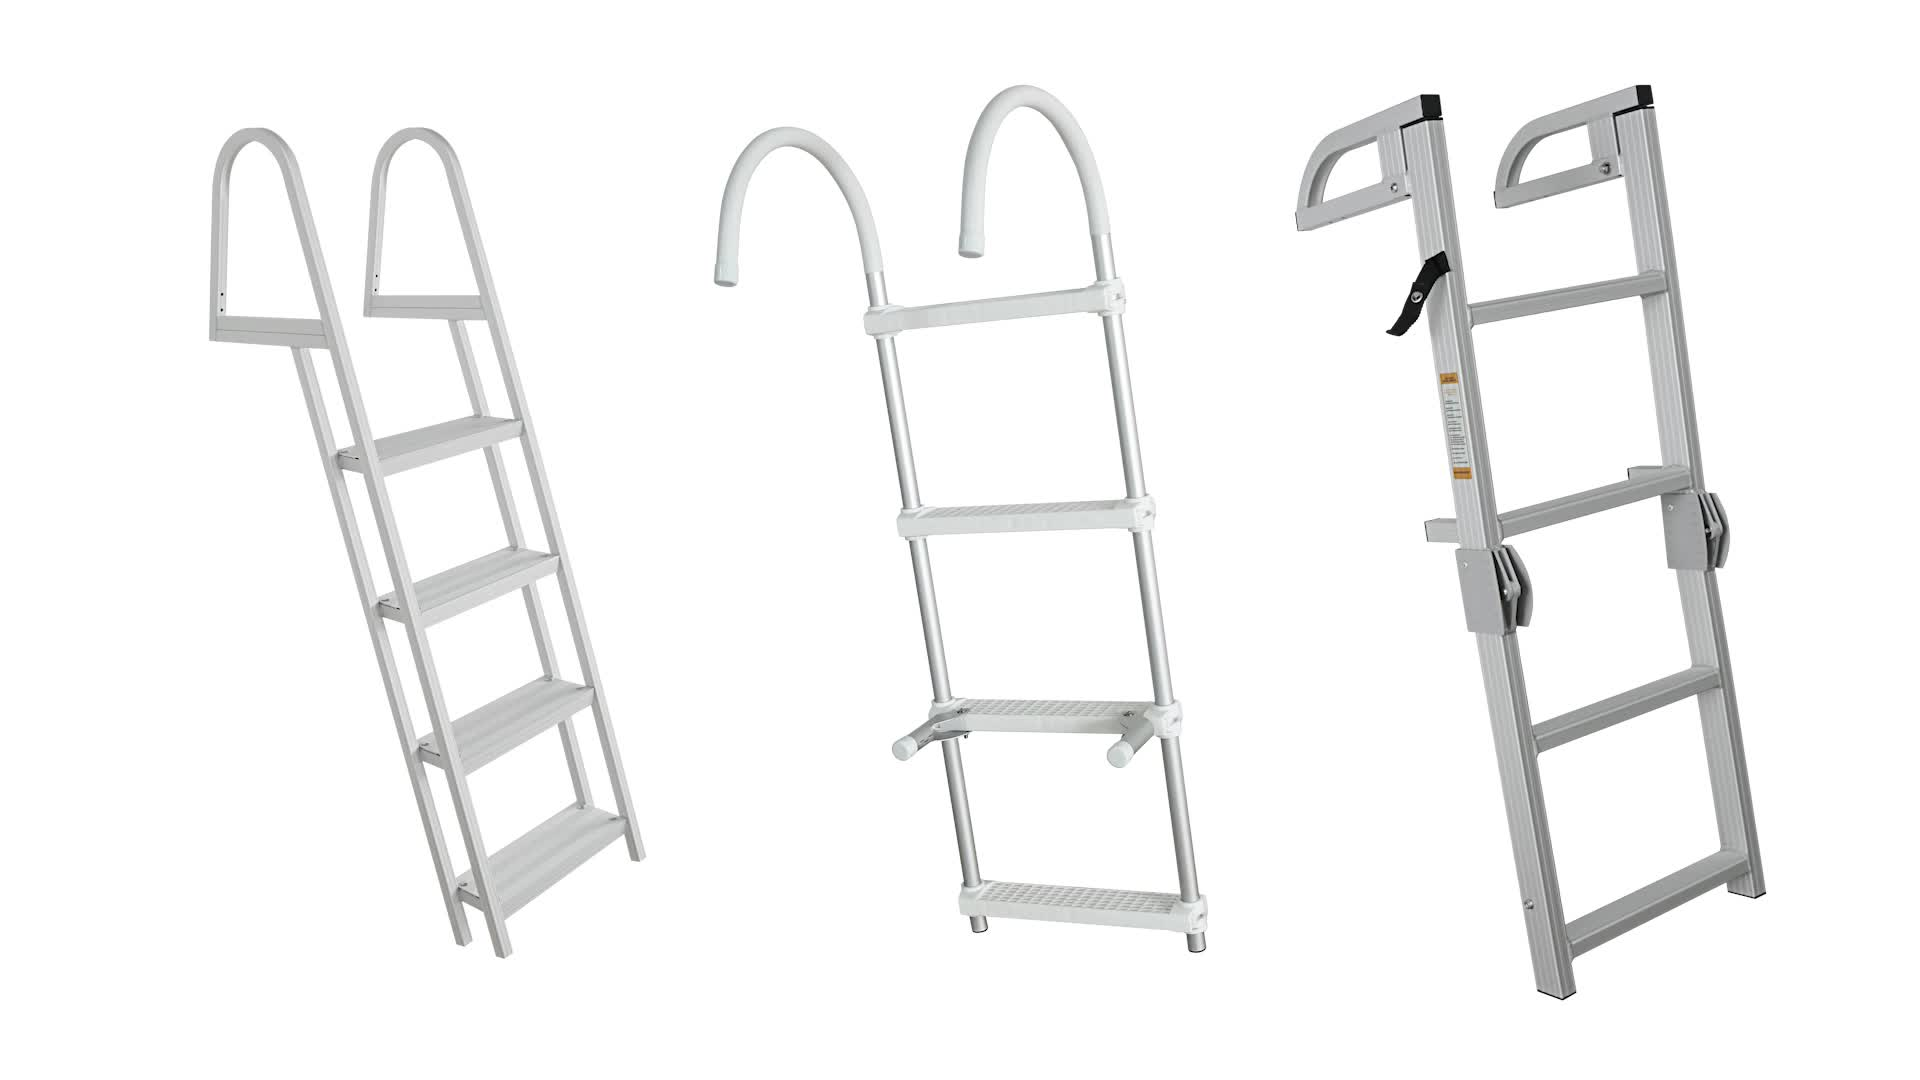 HOMFUL Portable Hook-on Inflatable Boat Boarding Ladder aluminum boat ladder